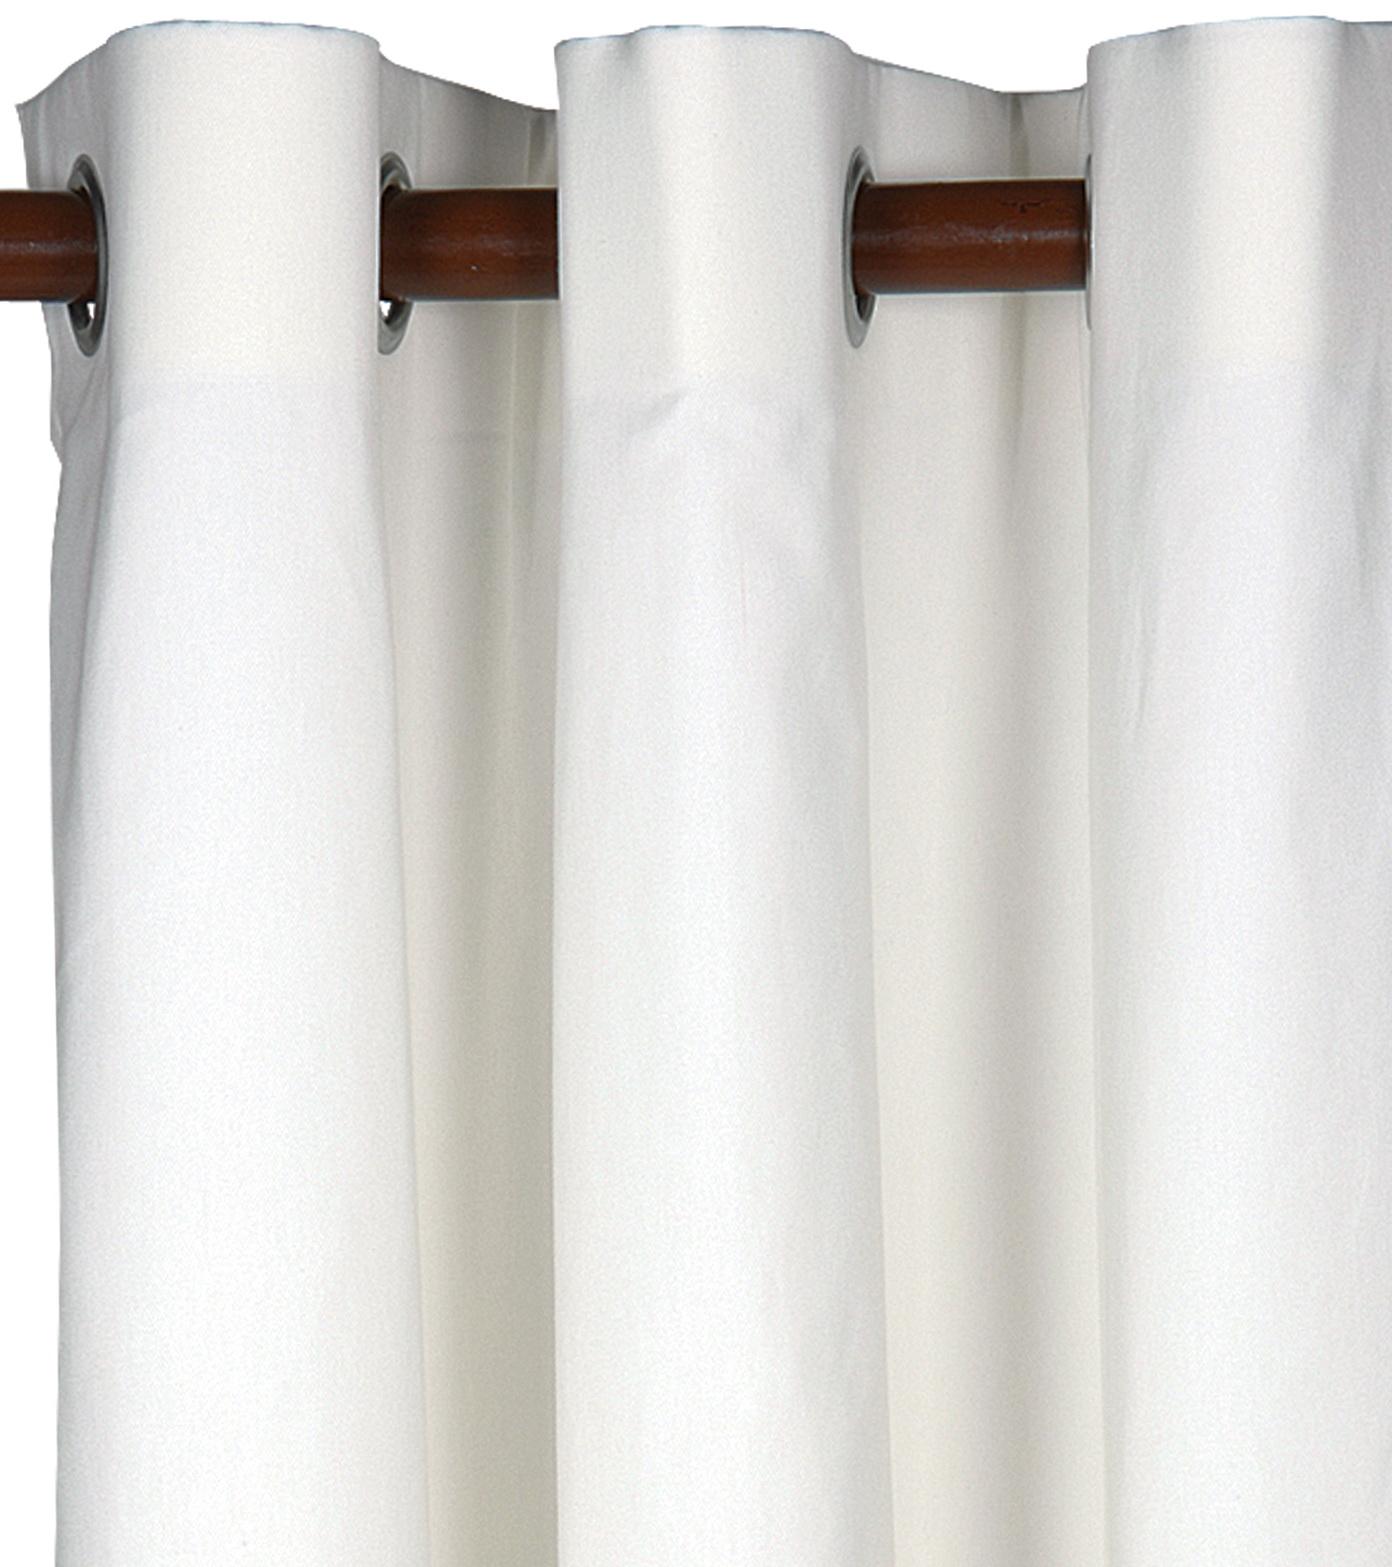 Grommet Blackout Curtains White